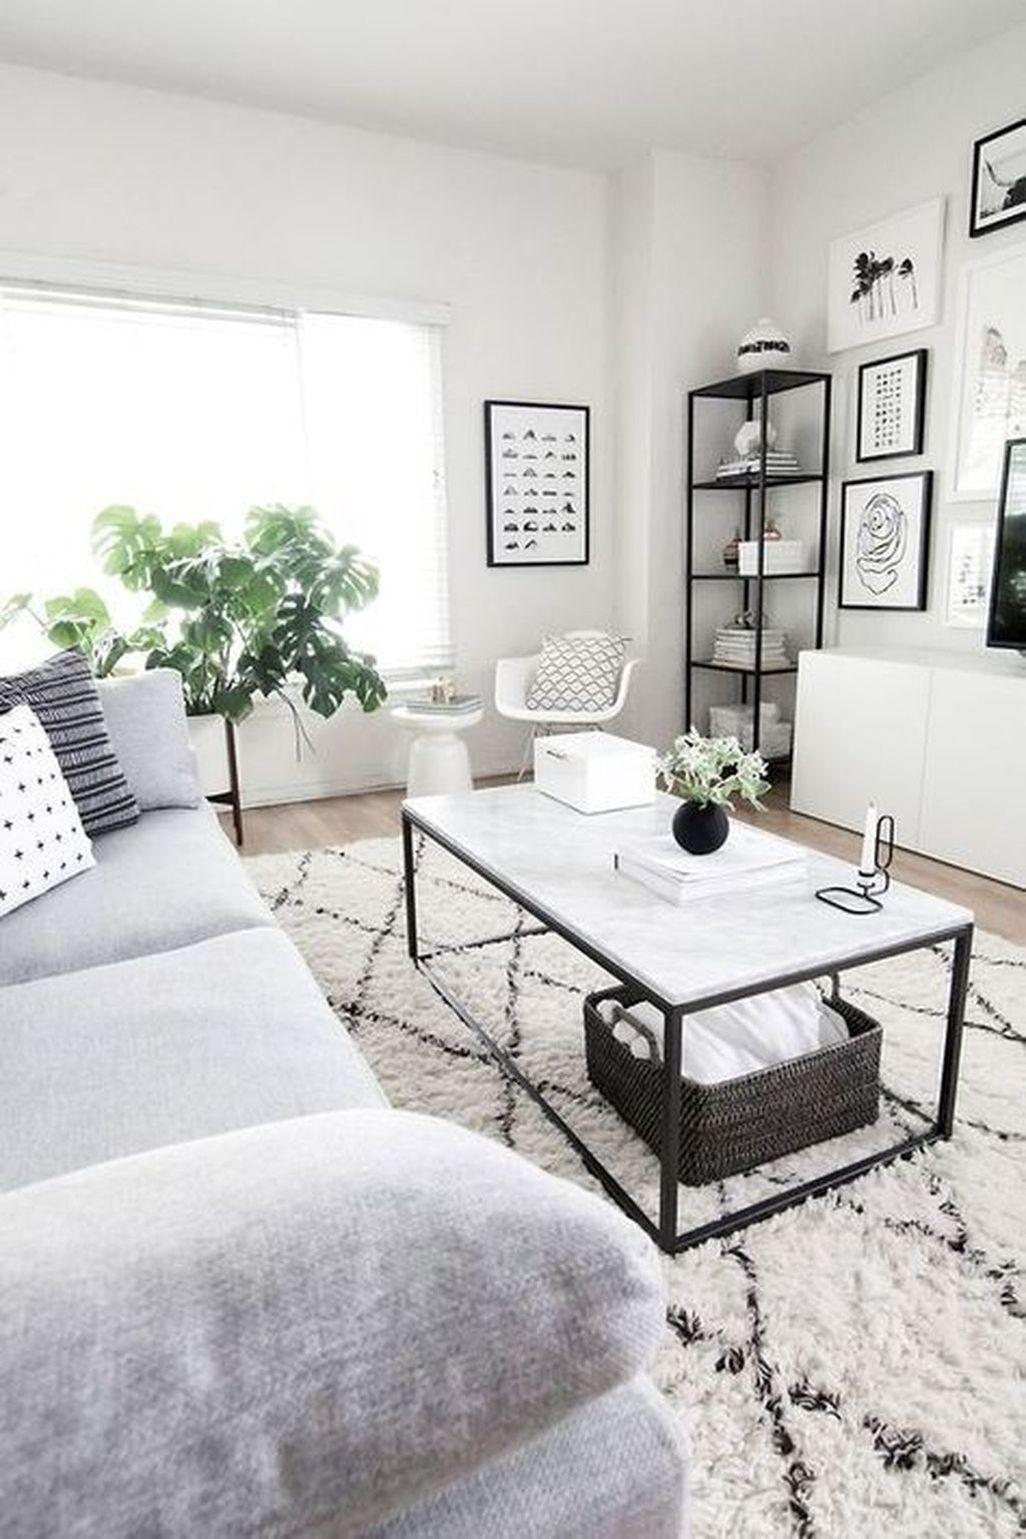 Cool popular space saving small studio decor ideas more at https also stunning scandinavian design interiors coffee interior living rh pinterest